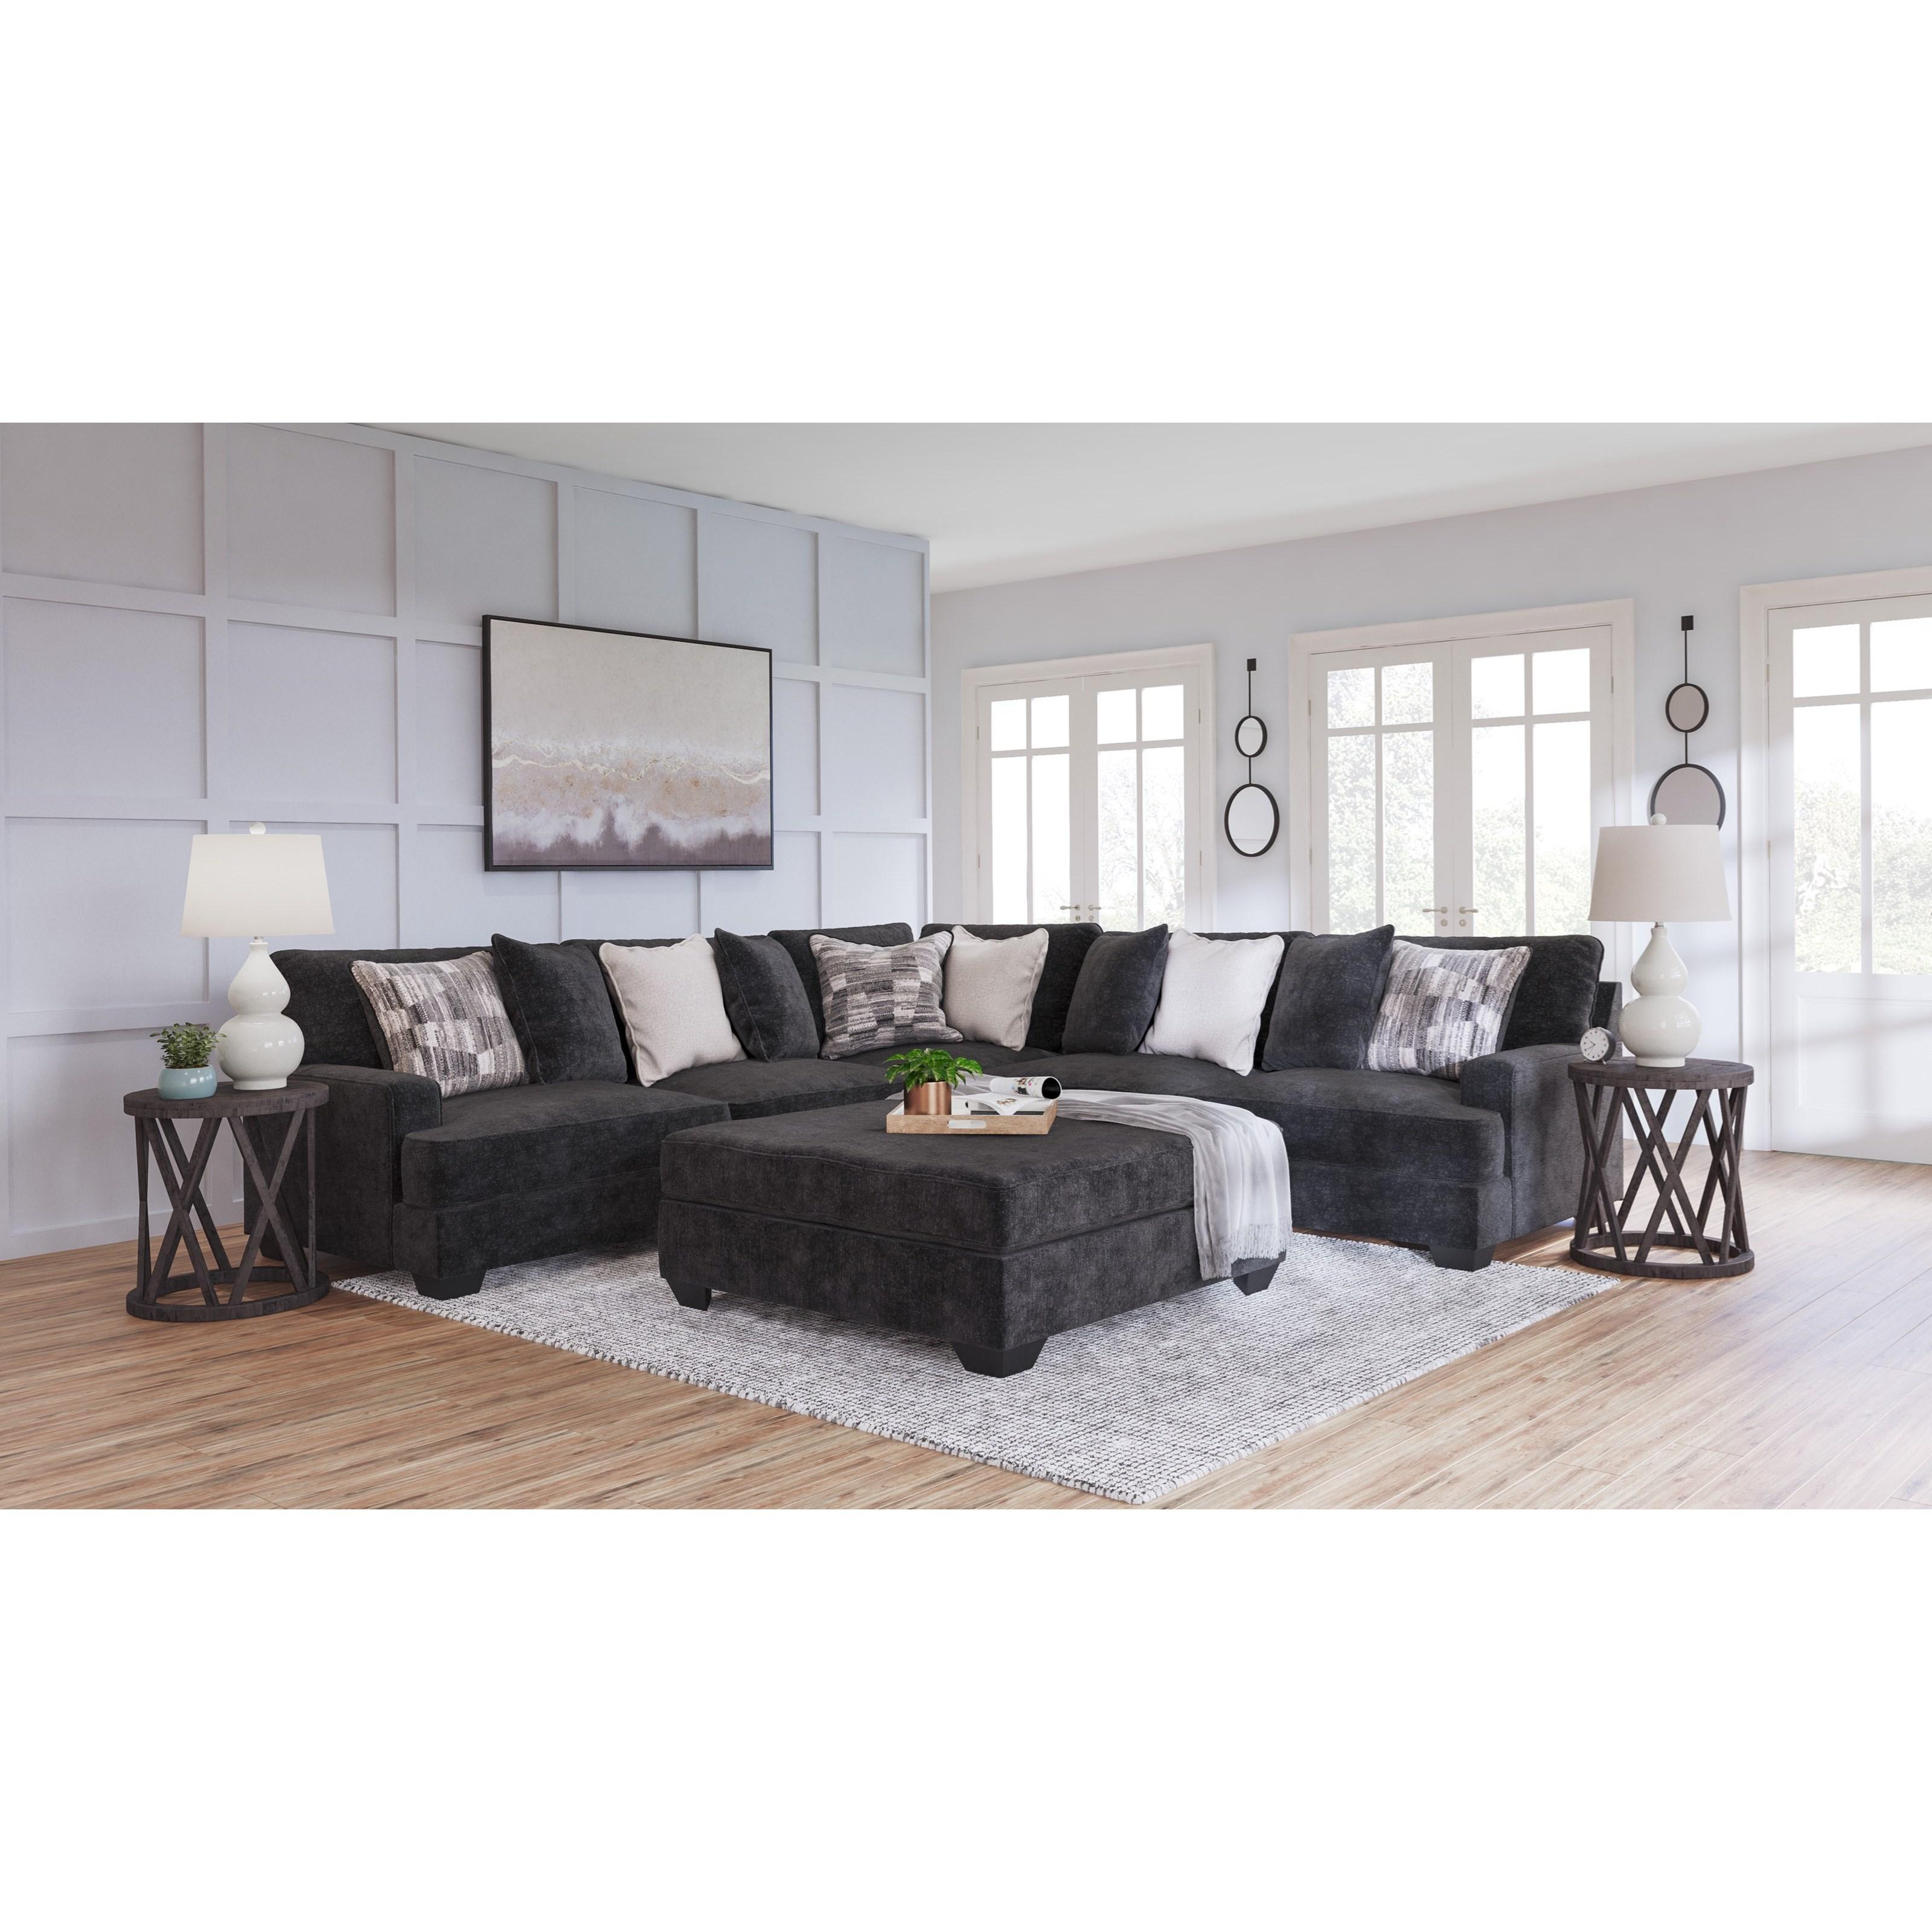 Lavernett Living Room Group by Ashley (Signature Design) at Johnny Janosik